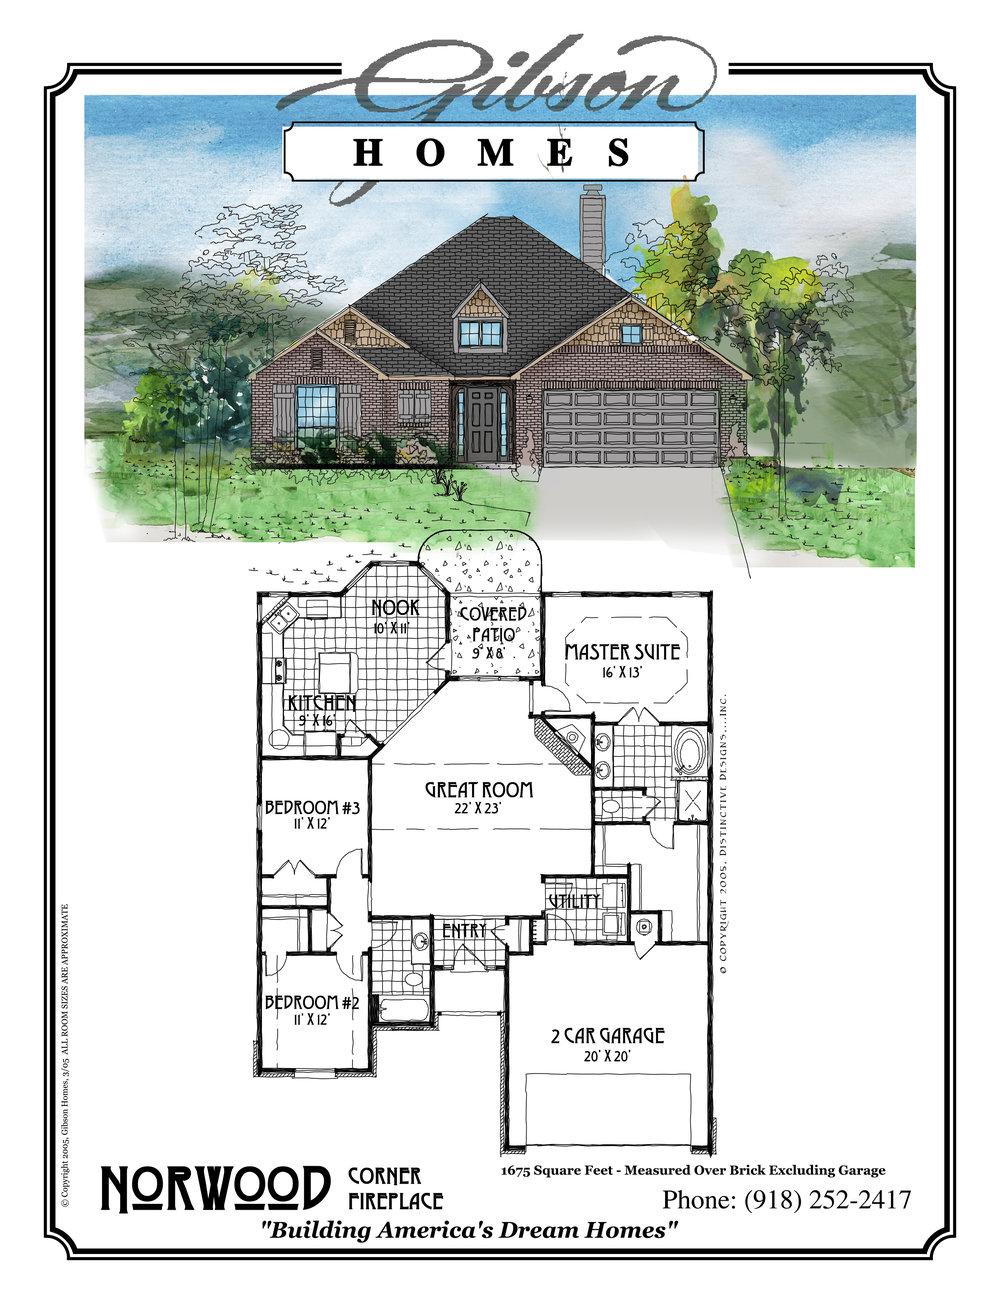 NORWOOD - 1694 Sq. Feet3 bedrooms2 bathrooms2 car garageBase Price $169,000